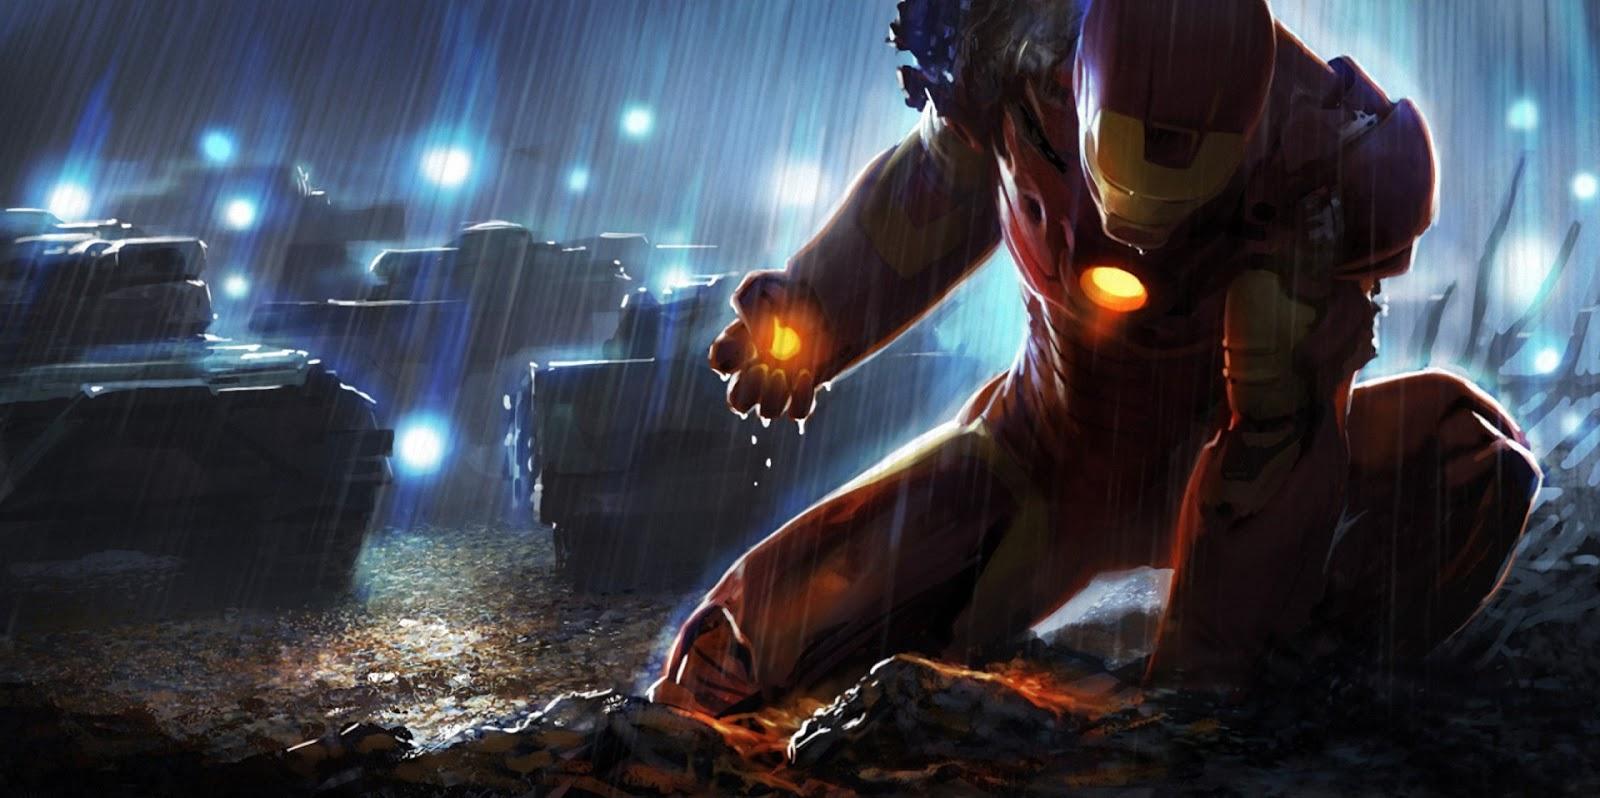 Iron Man Comic Marvel Heroes Superhero Raining Tanks HD Wallpaper 1600x798